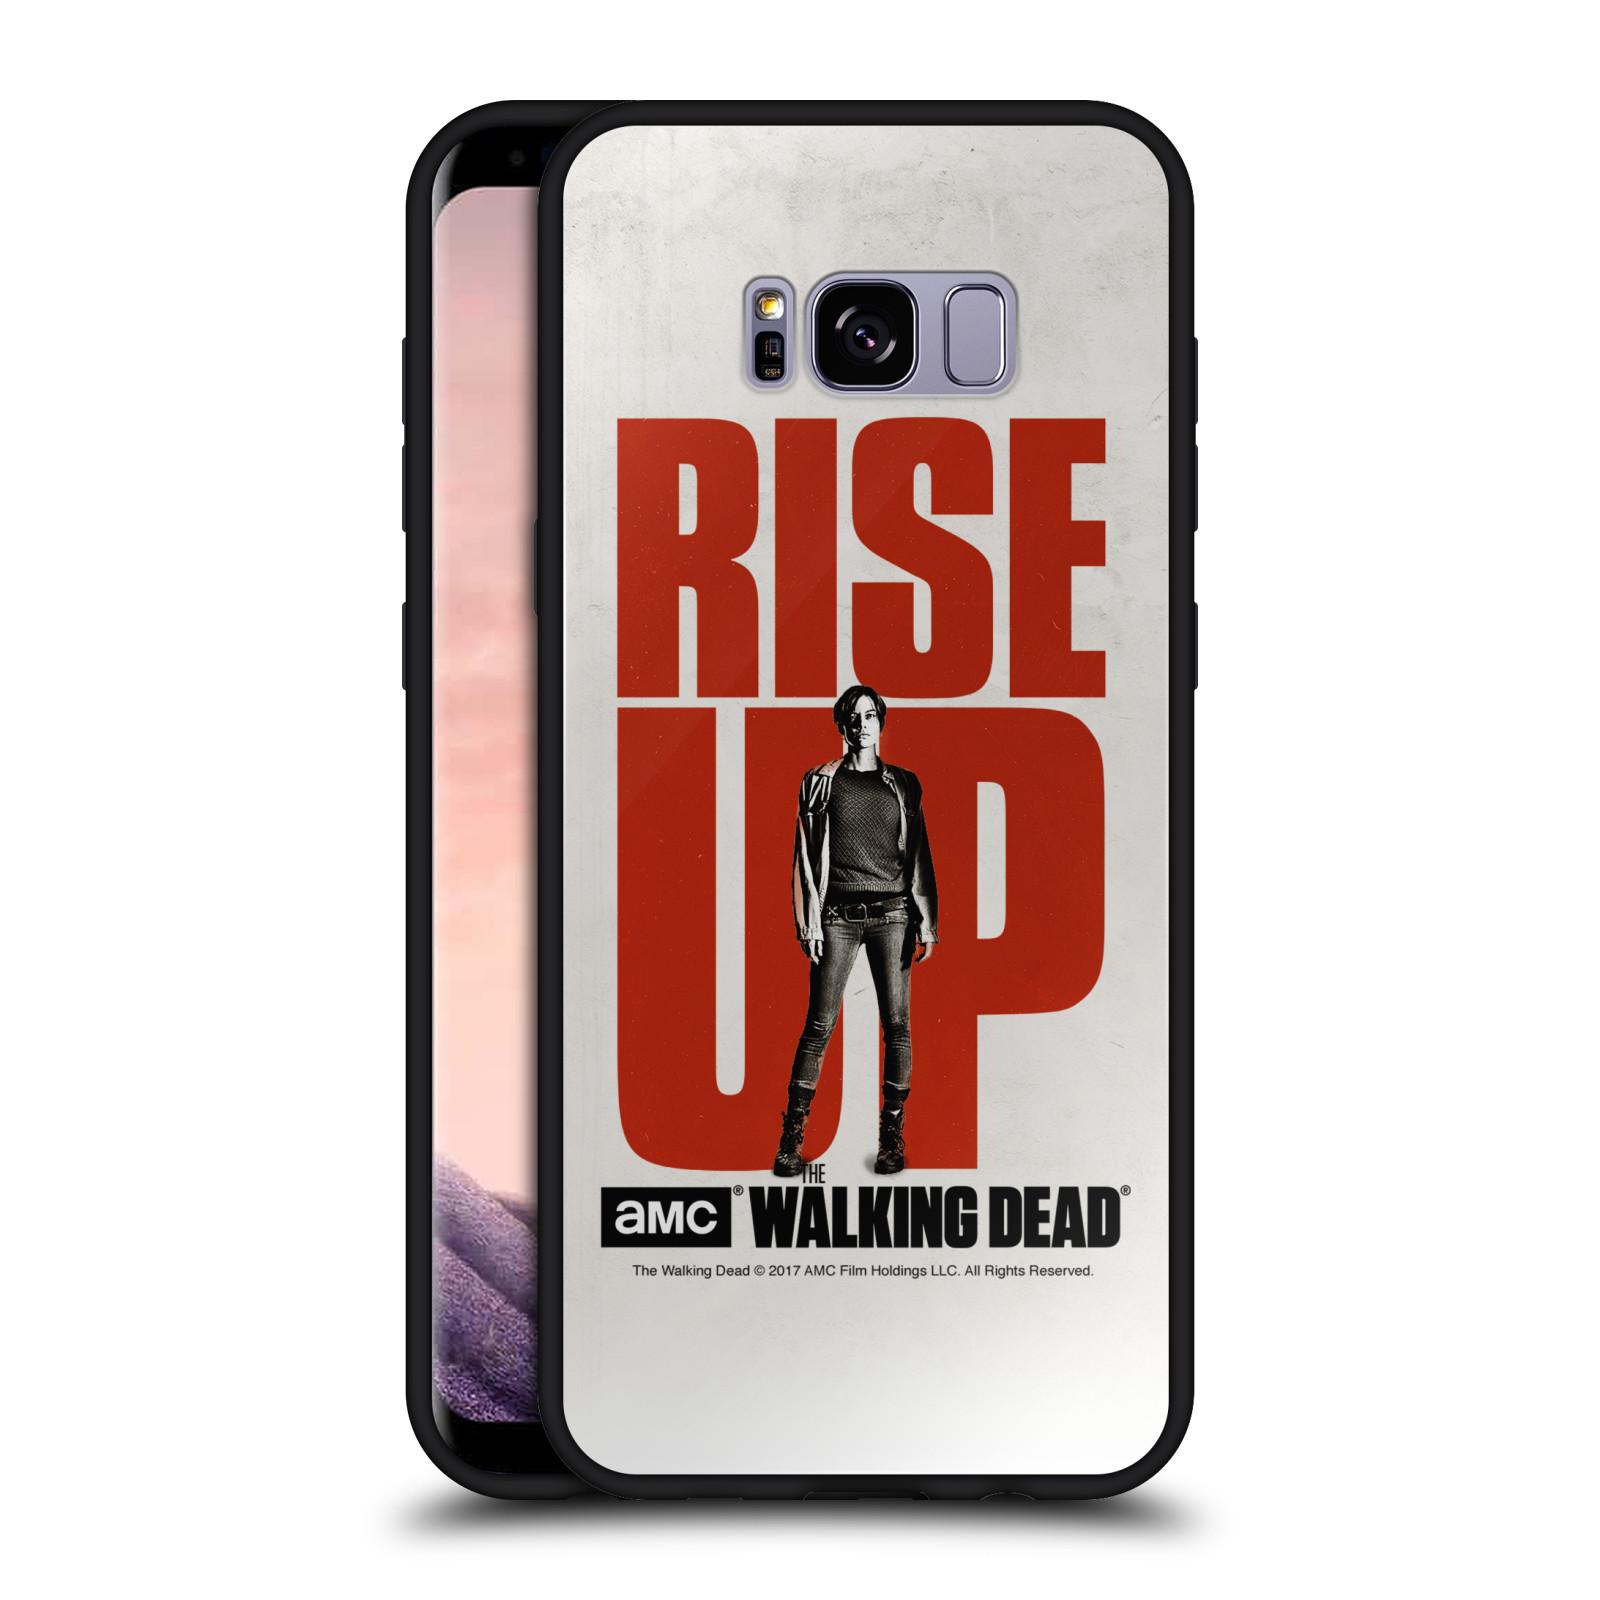 OFFICIAL-AMC-THE-WALKING-DEAD-RISE-UP-BLACK-HYBRID-GLASS-CASE-FOR-SAMSUNG-PHONES